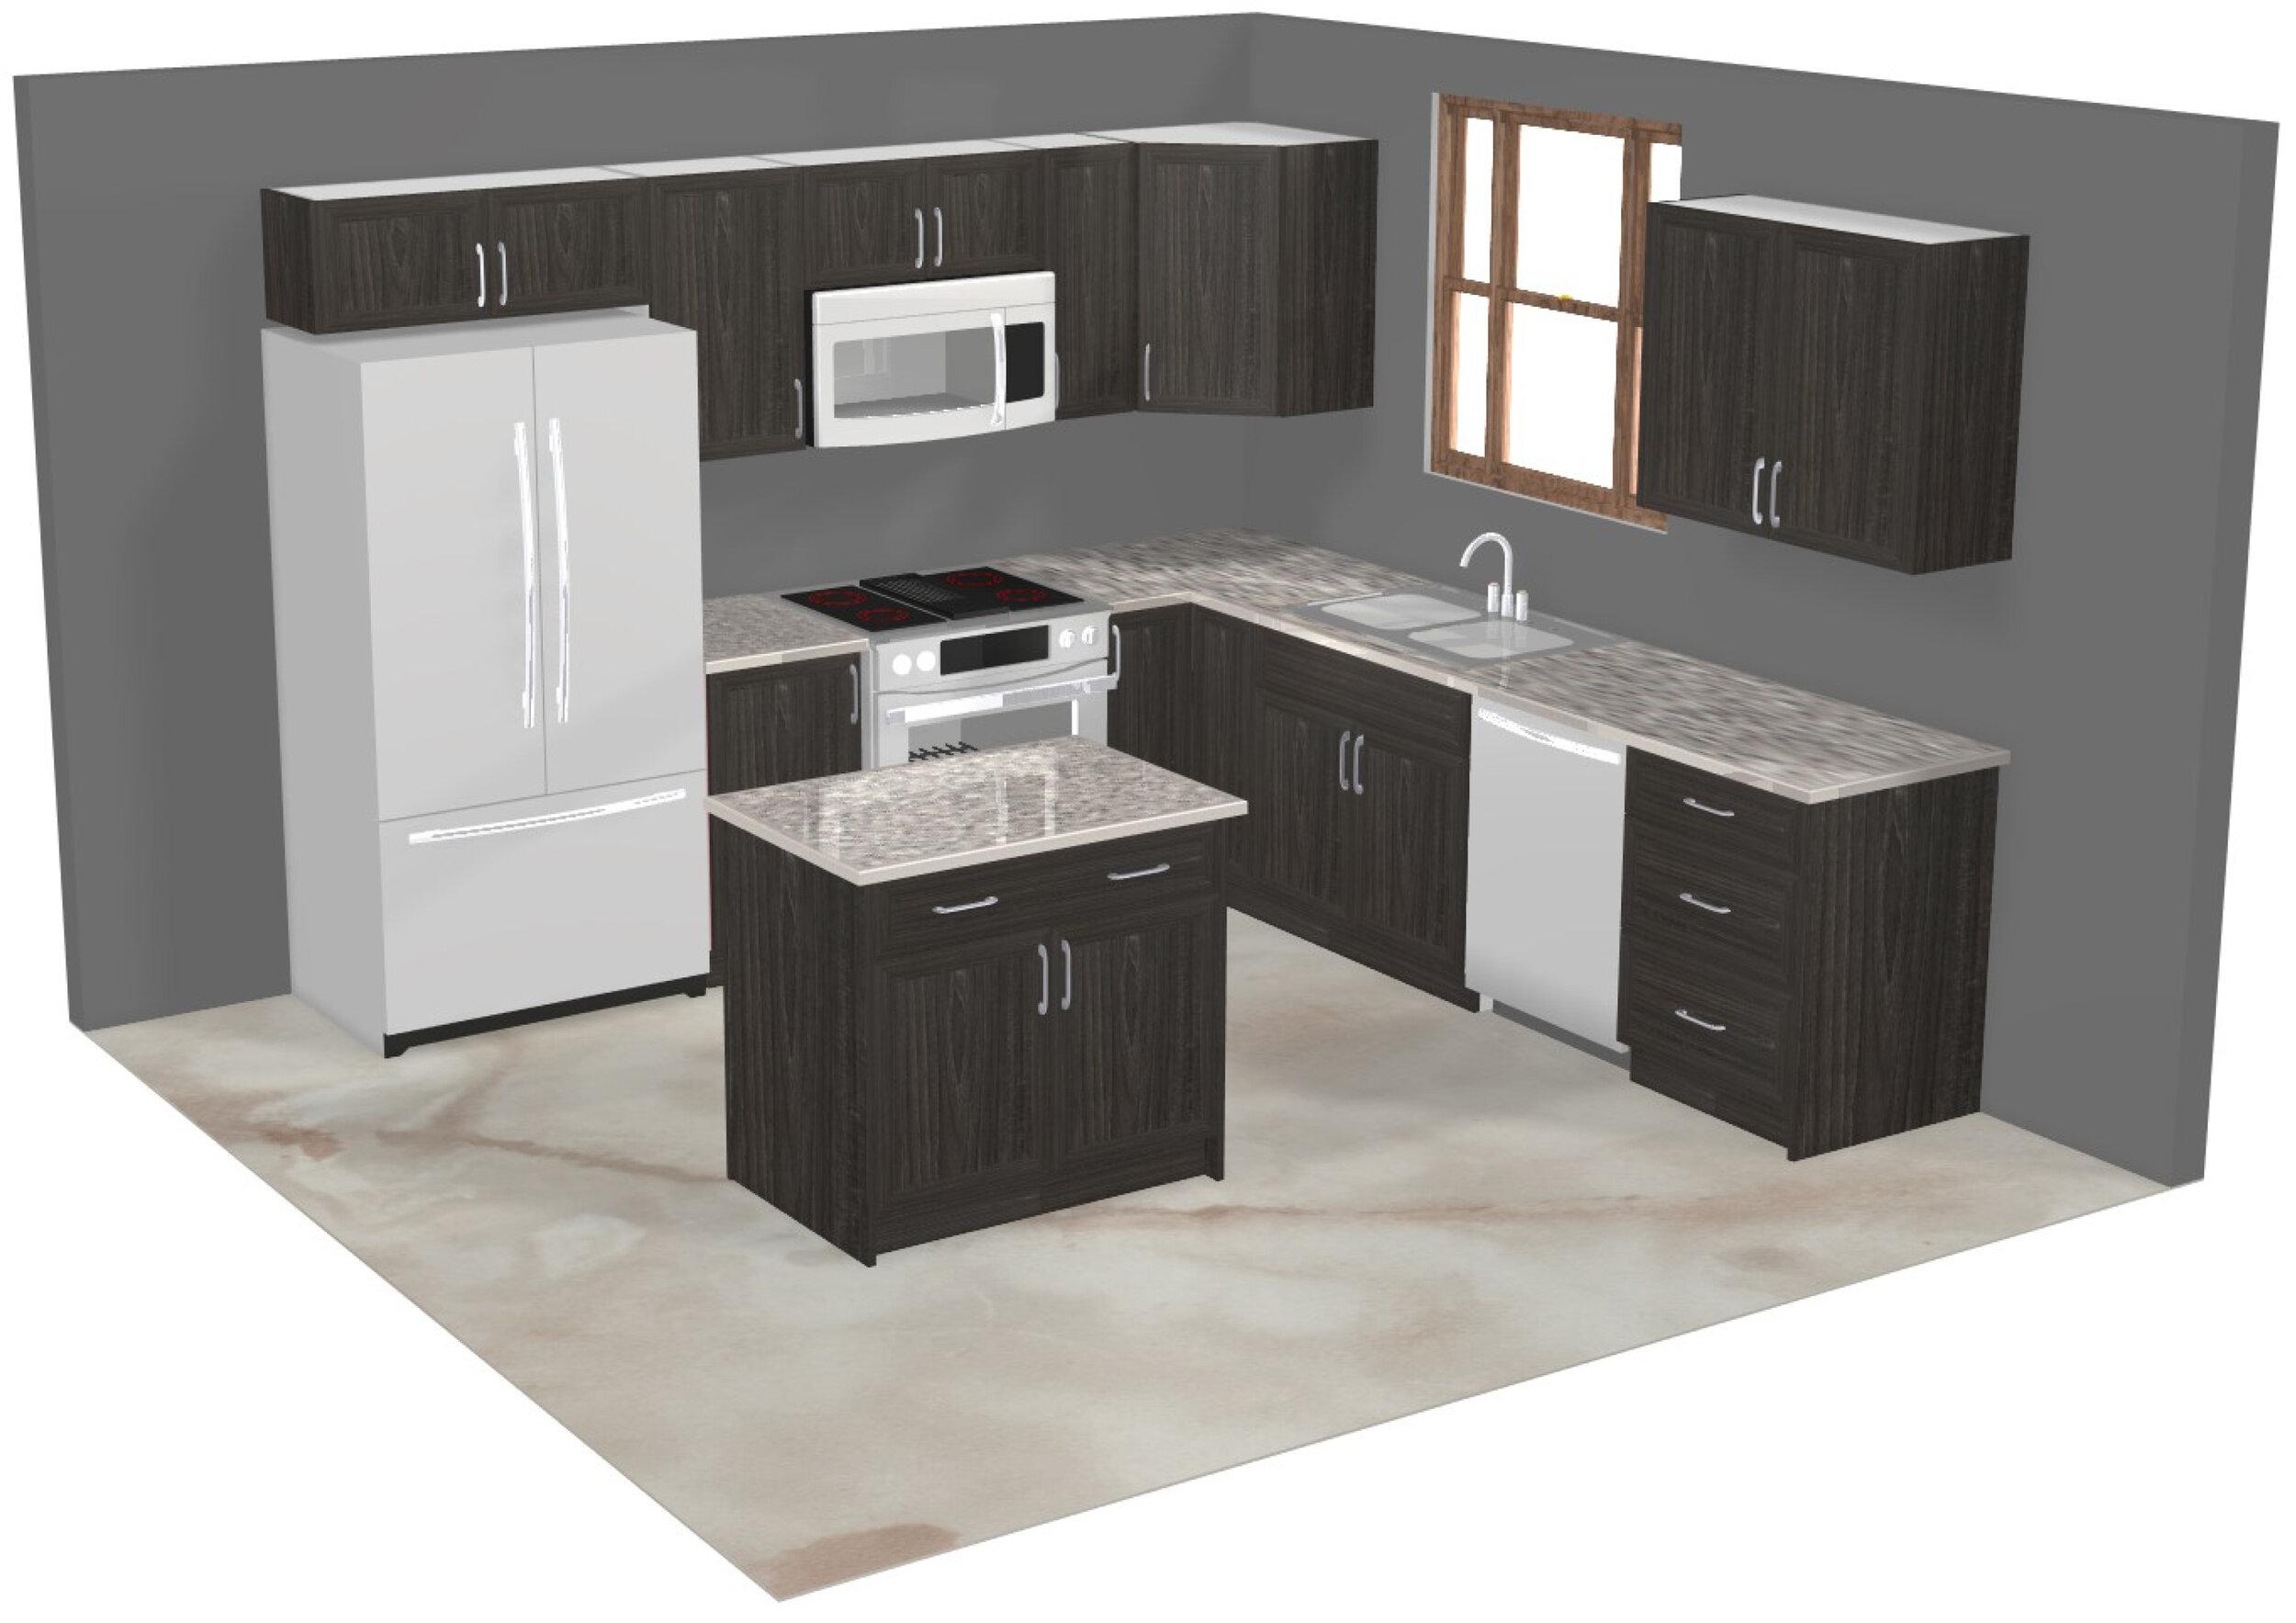 Cupboards Express, Kitchen Cabinet Liquidation Calgary